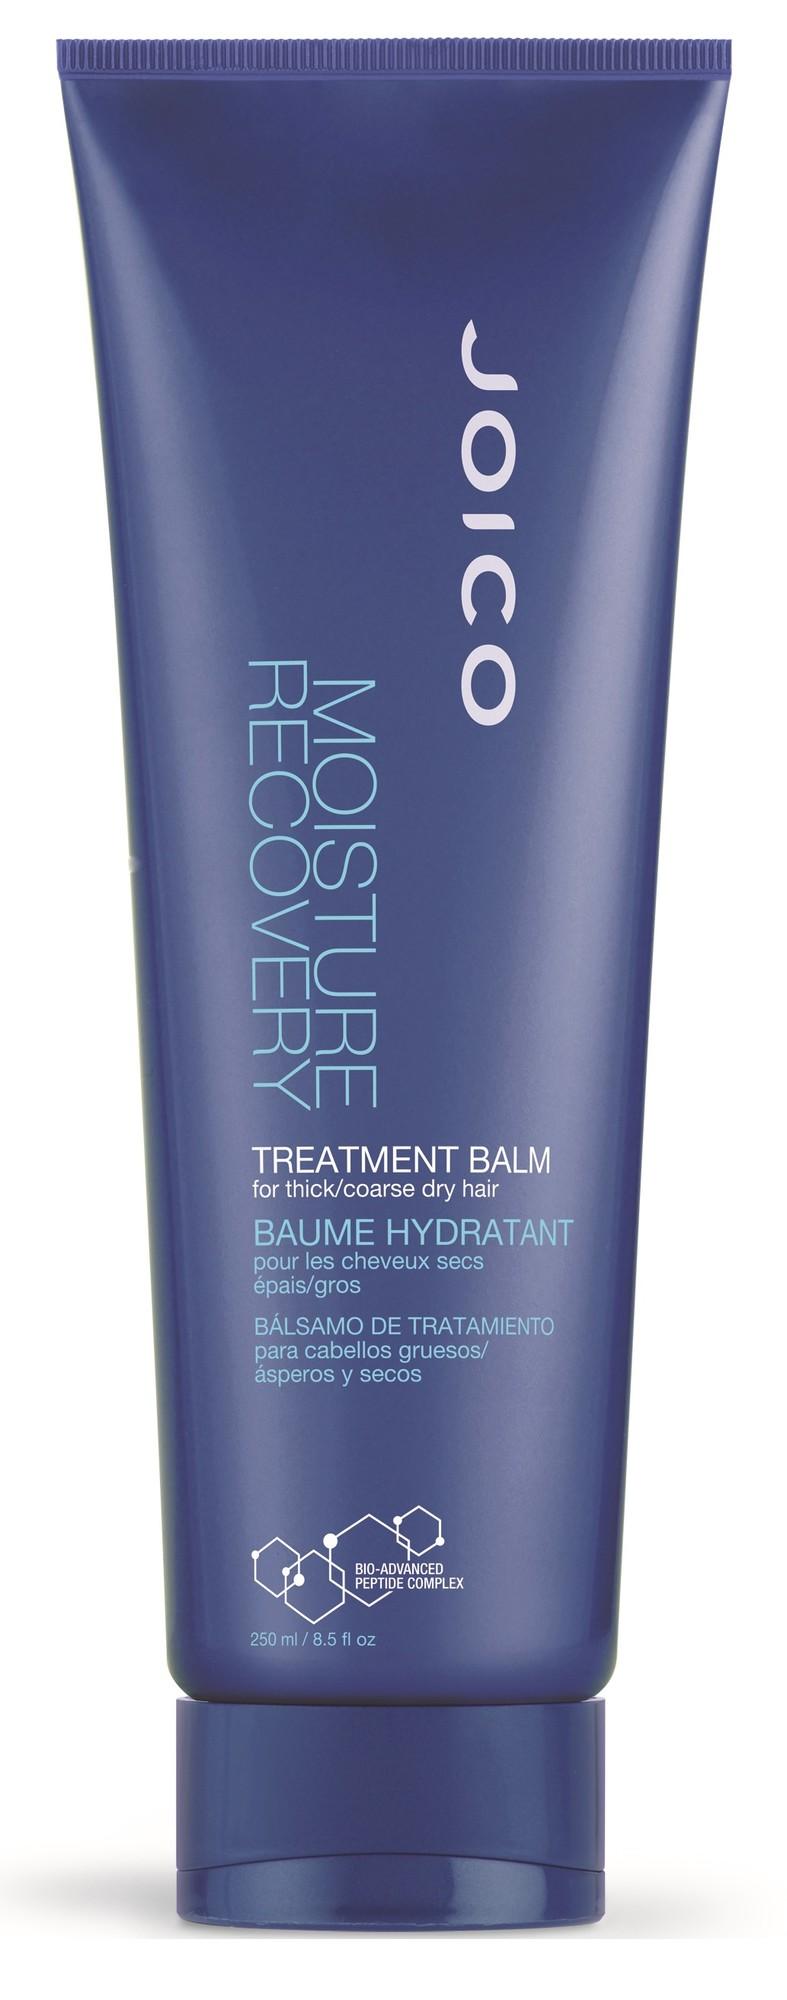 Moisture Recovery Treatment Balm 250 ml